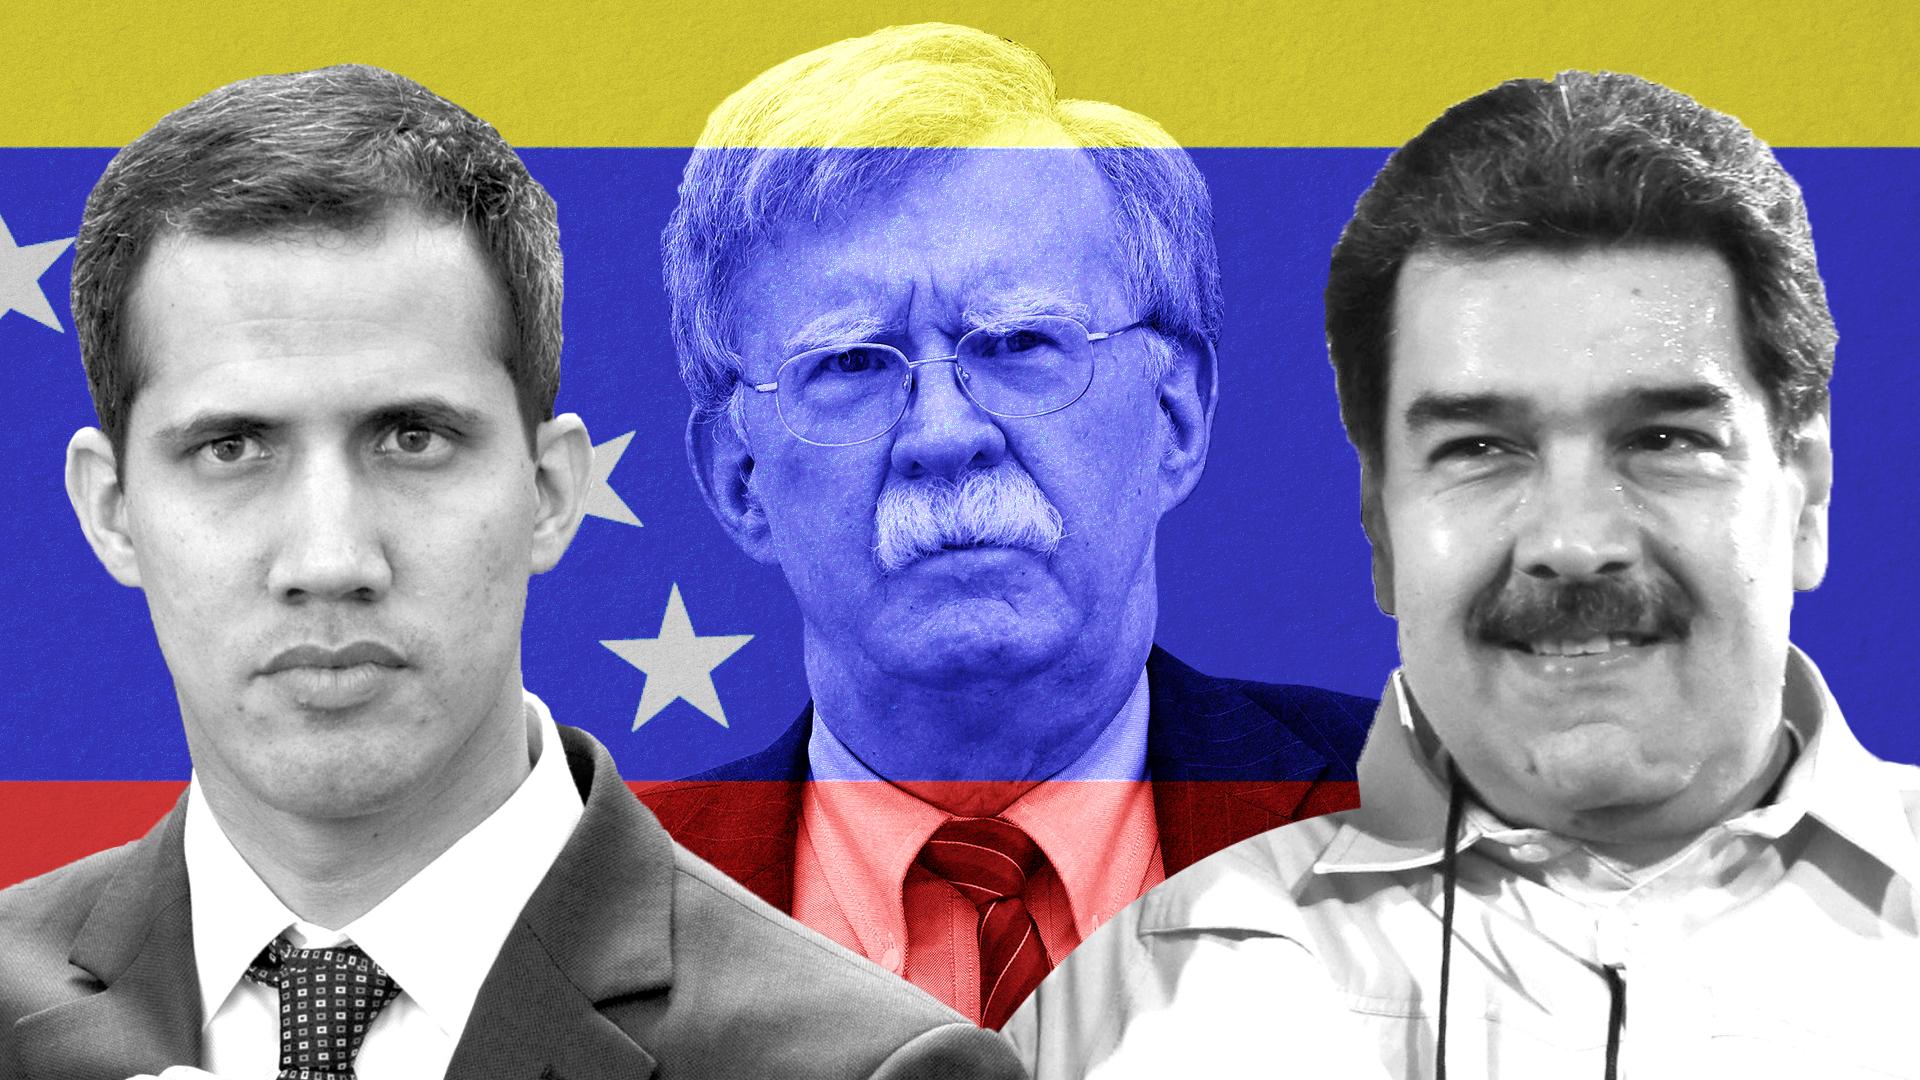 The real reason Venezuela's Maduro survives: Dirty money